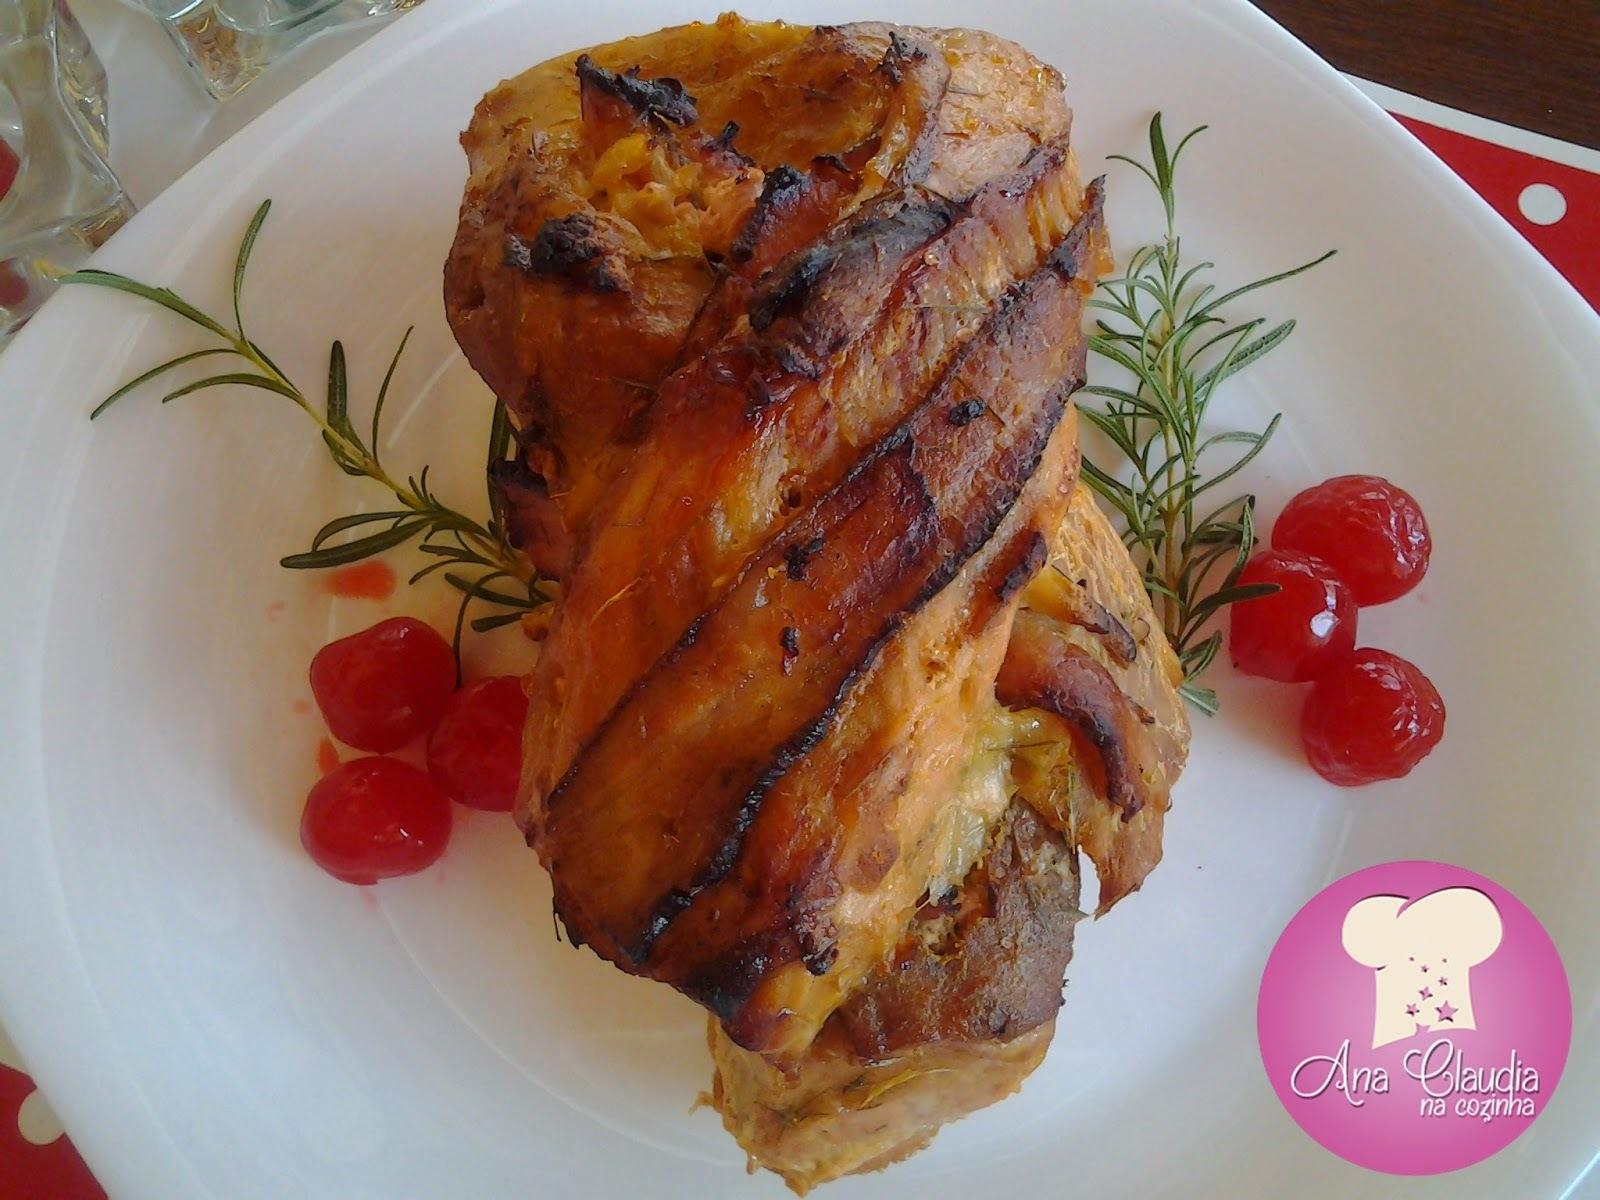 Lombo Trançado com Bacon